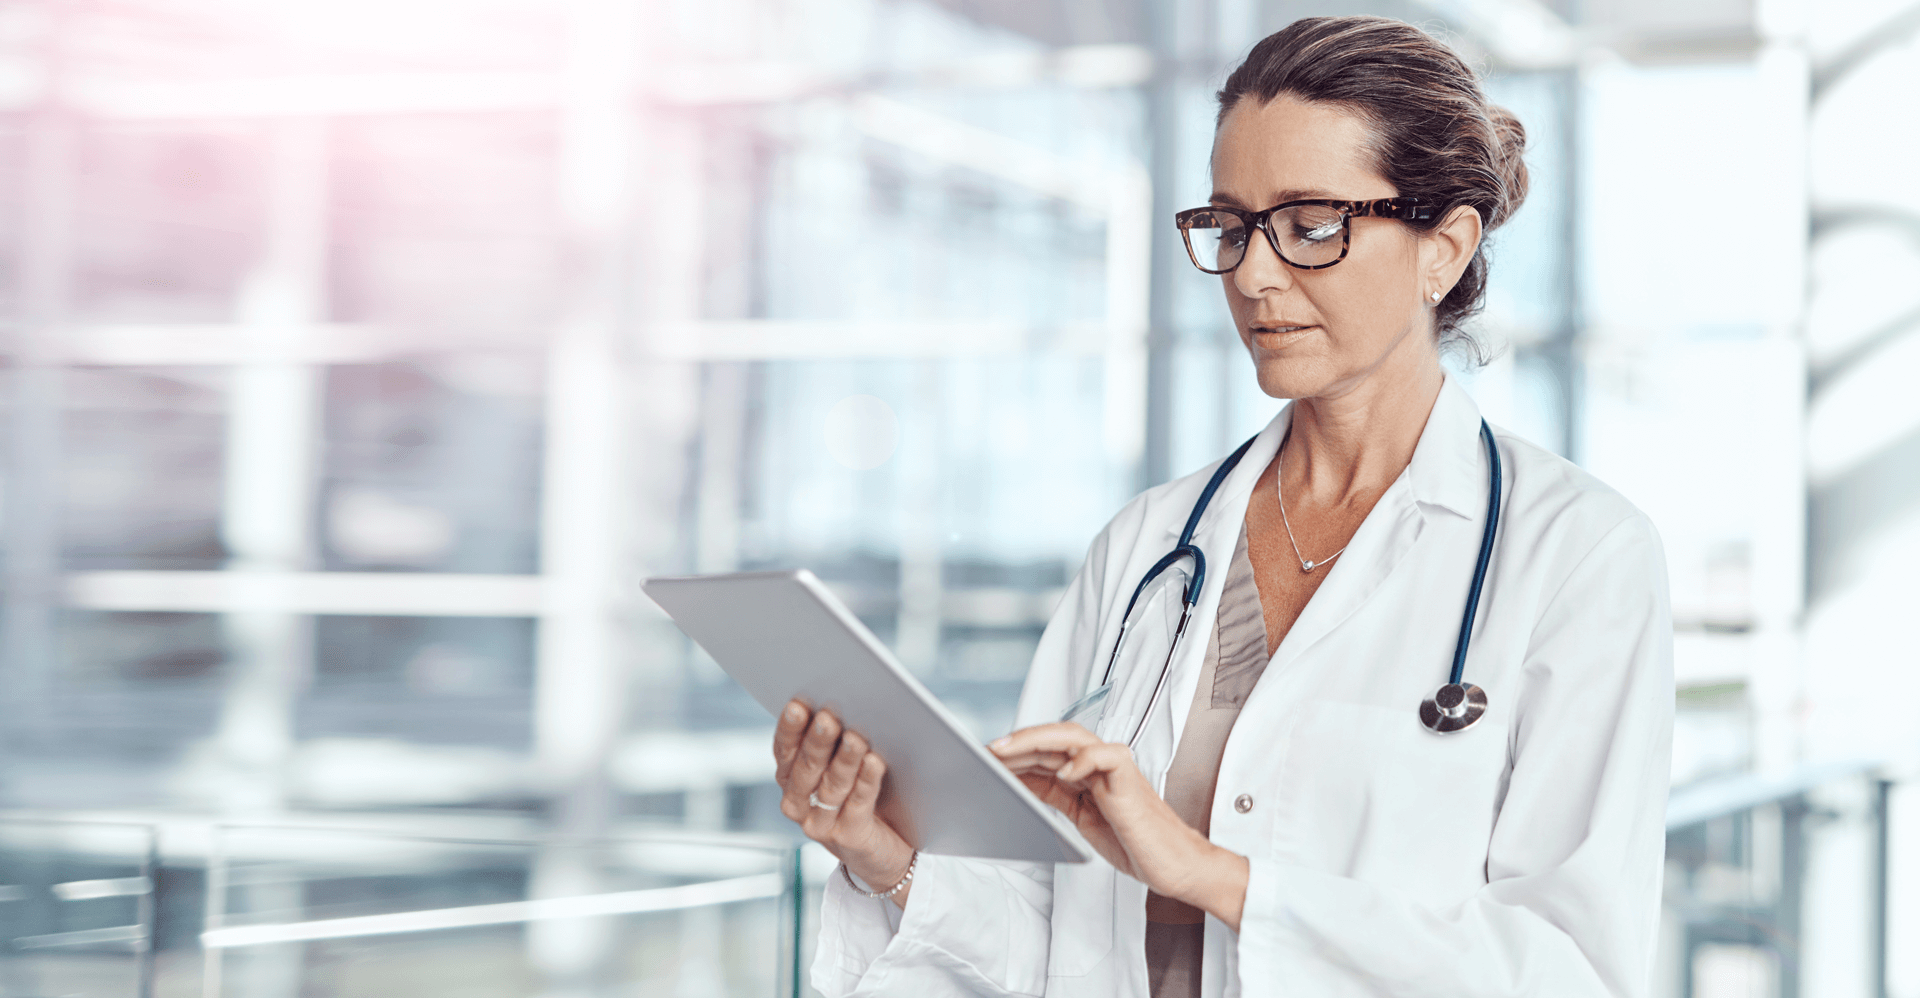 Fragen-Finanzberatung-Mediziner